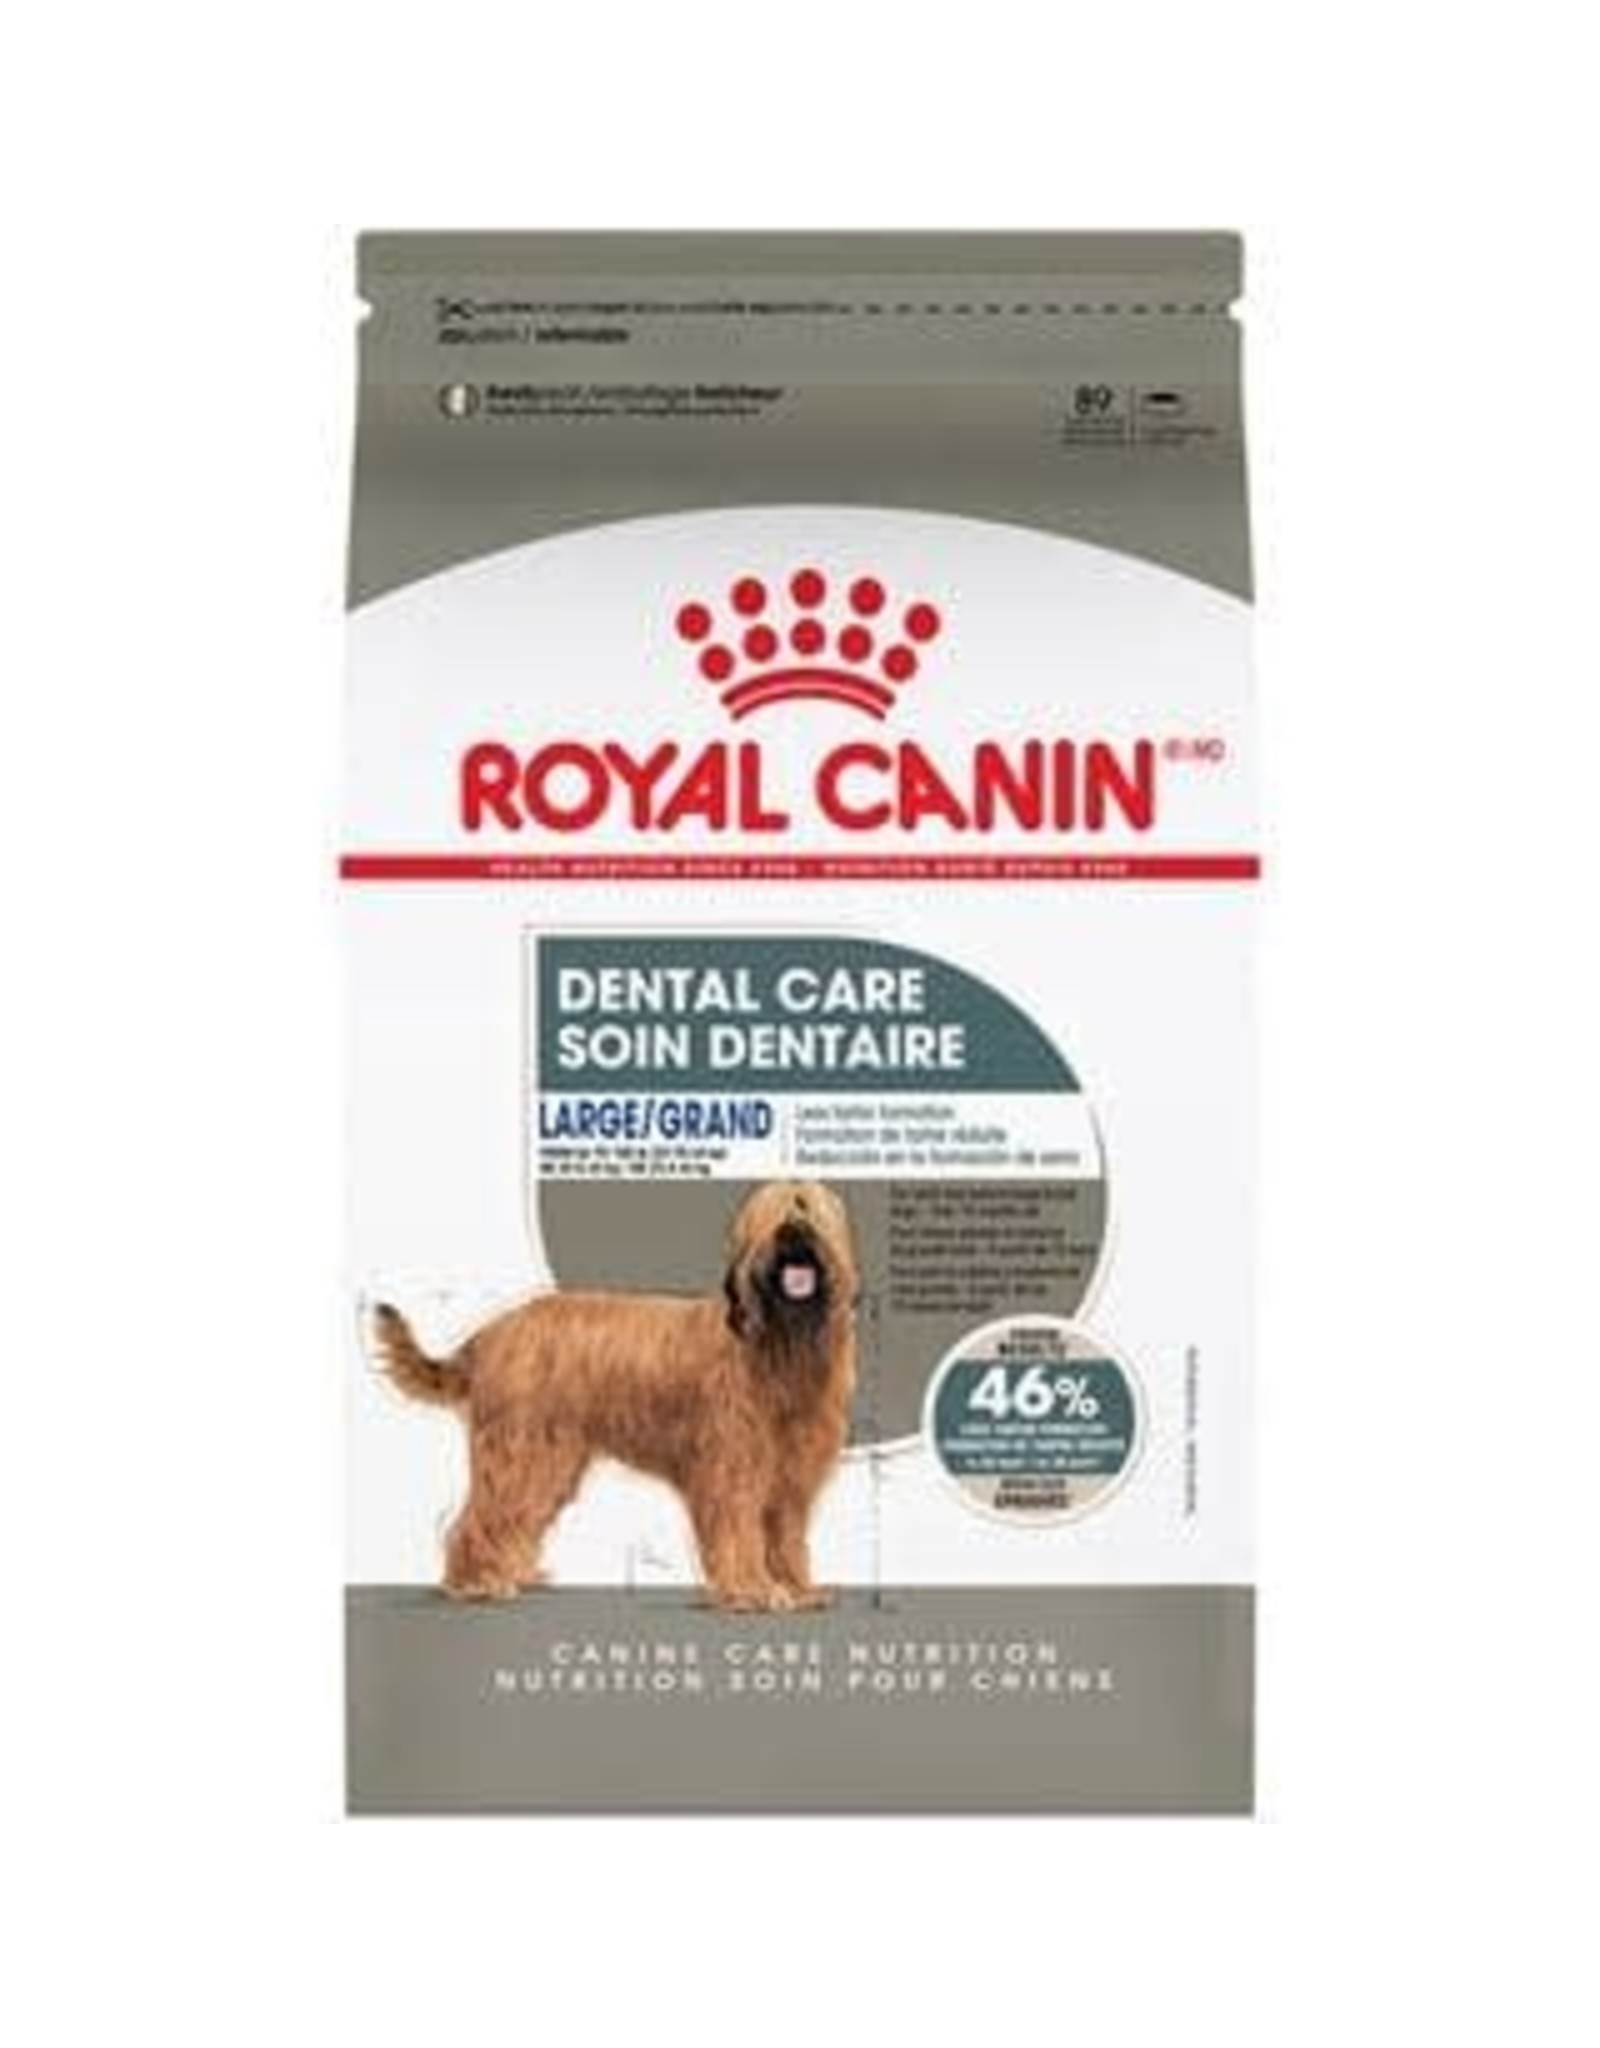 Royal Canin Royal Canin Dog - Dental Large 30lb